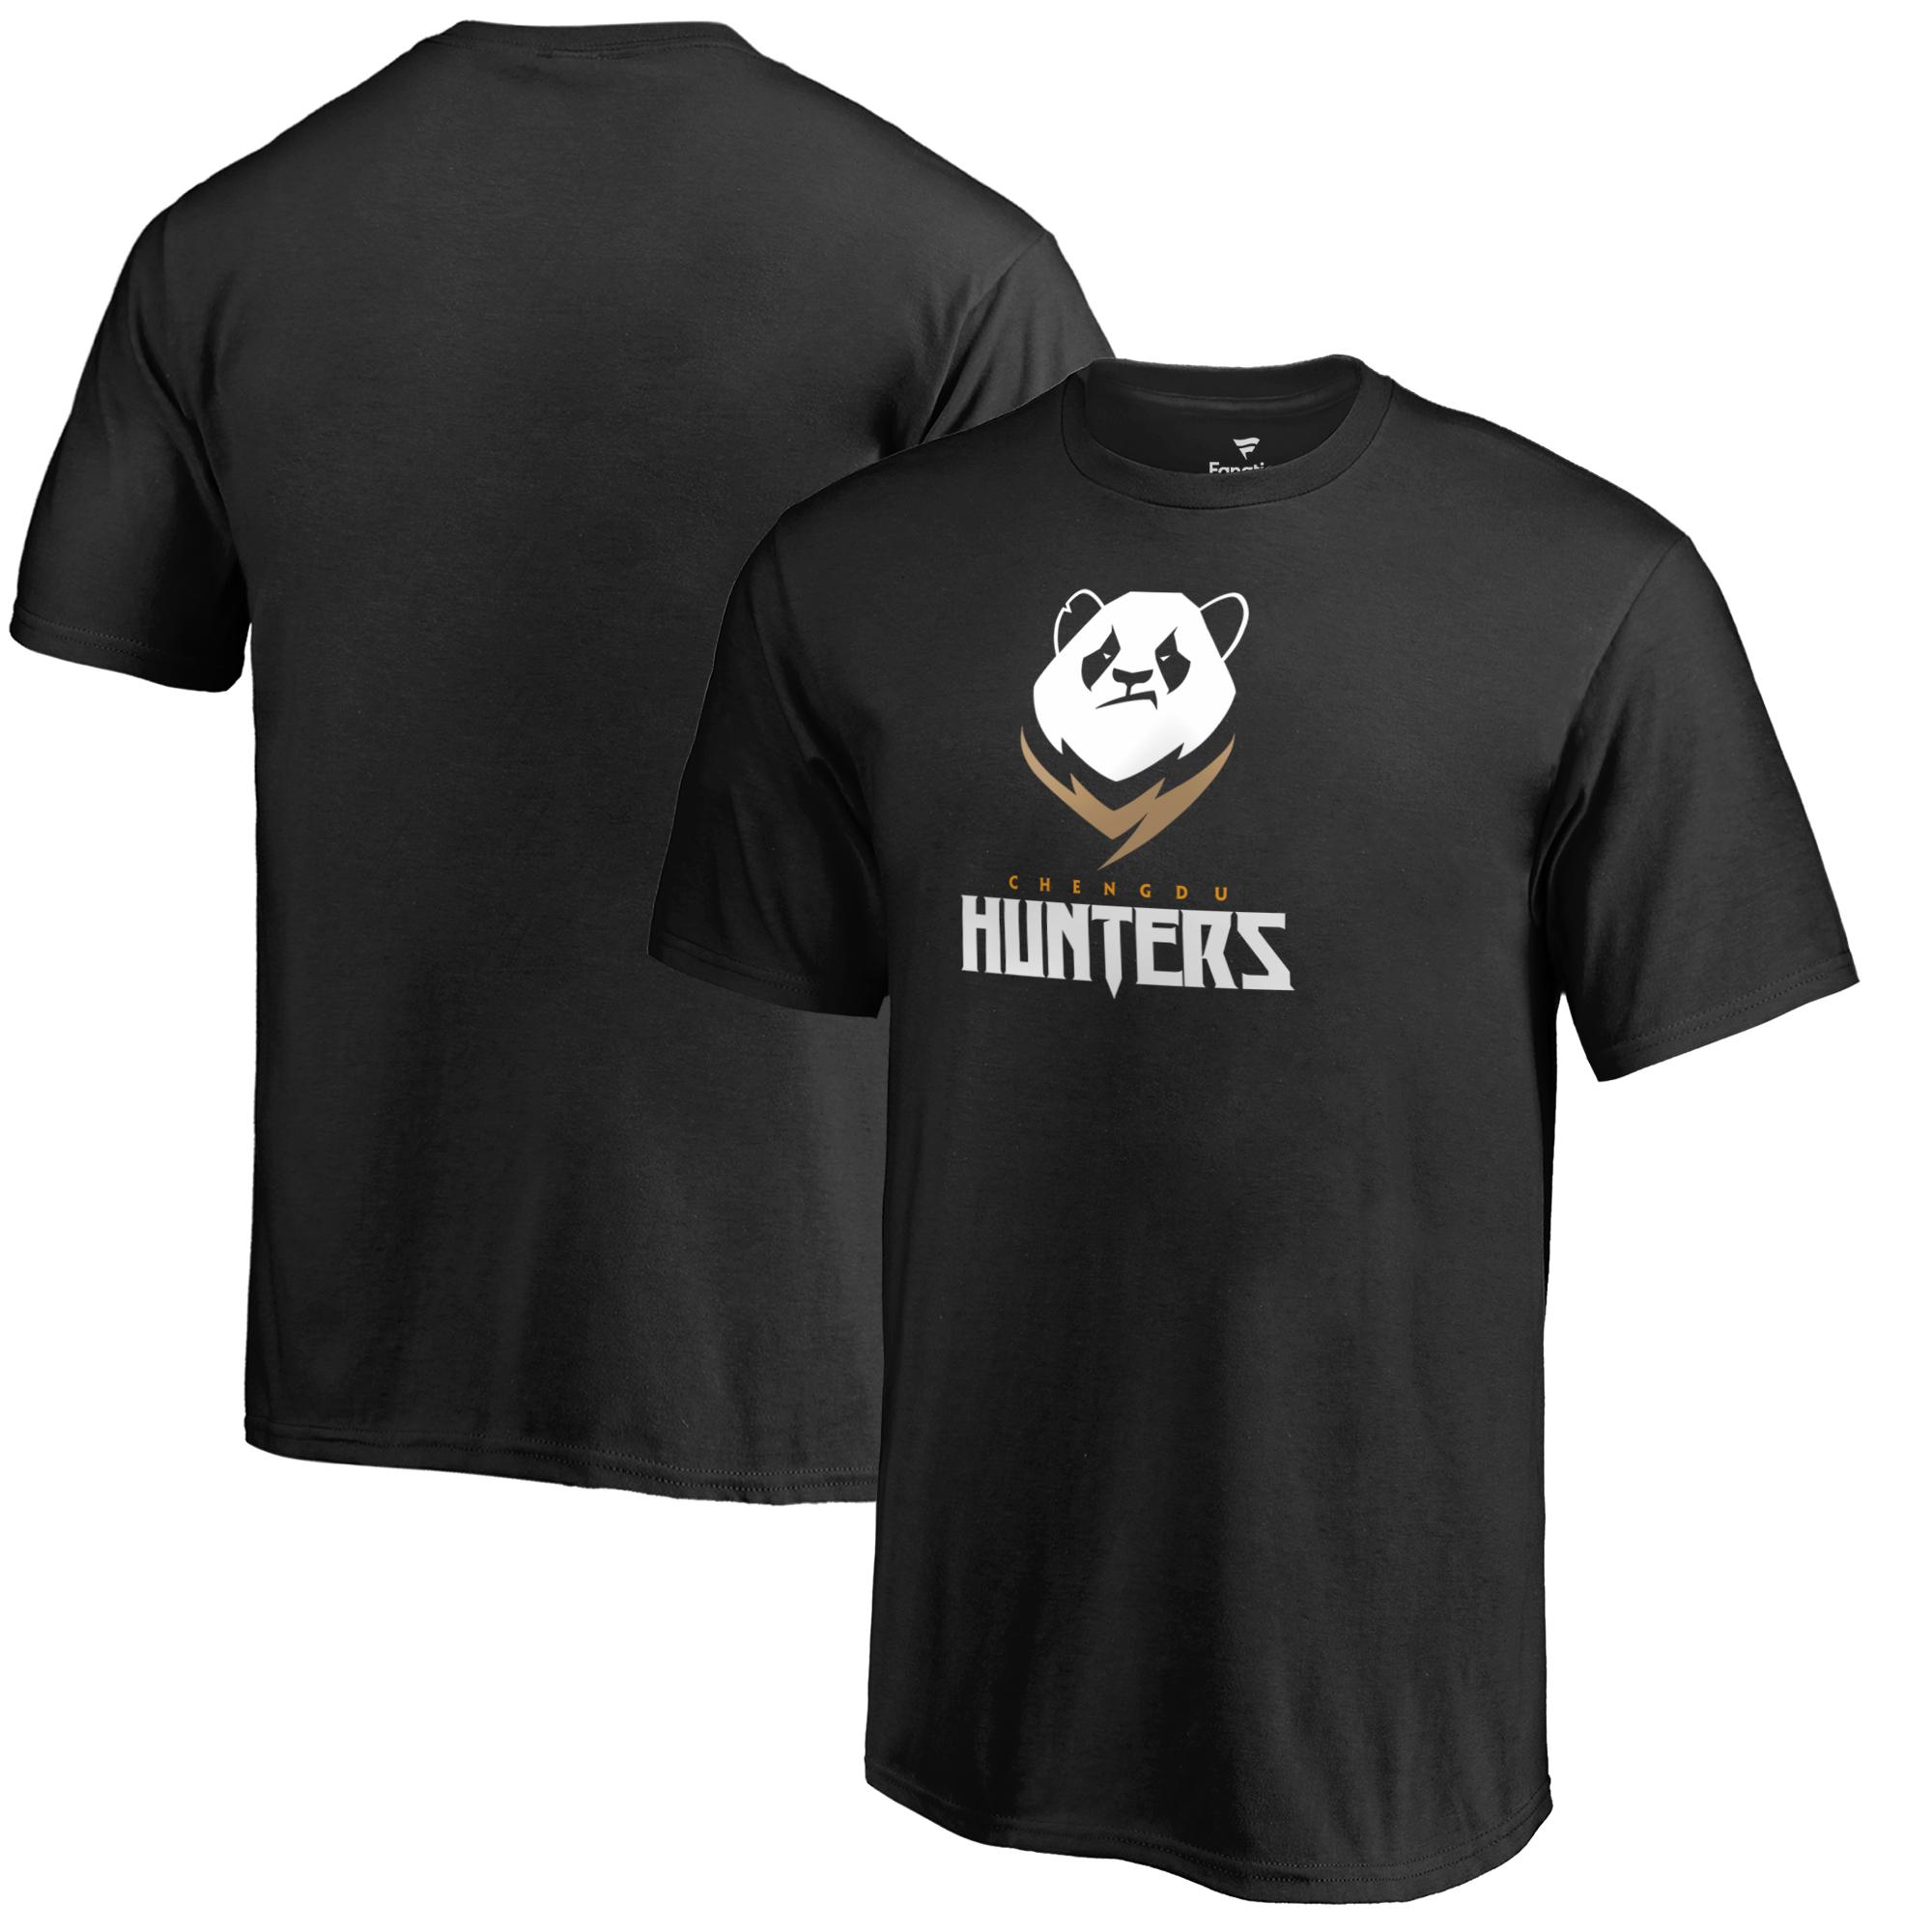 Chengdu Hunters Fanatics Branded Youth Team Identity T-Shirt - Black